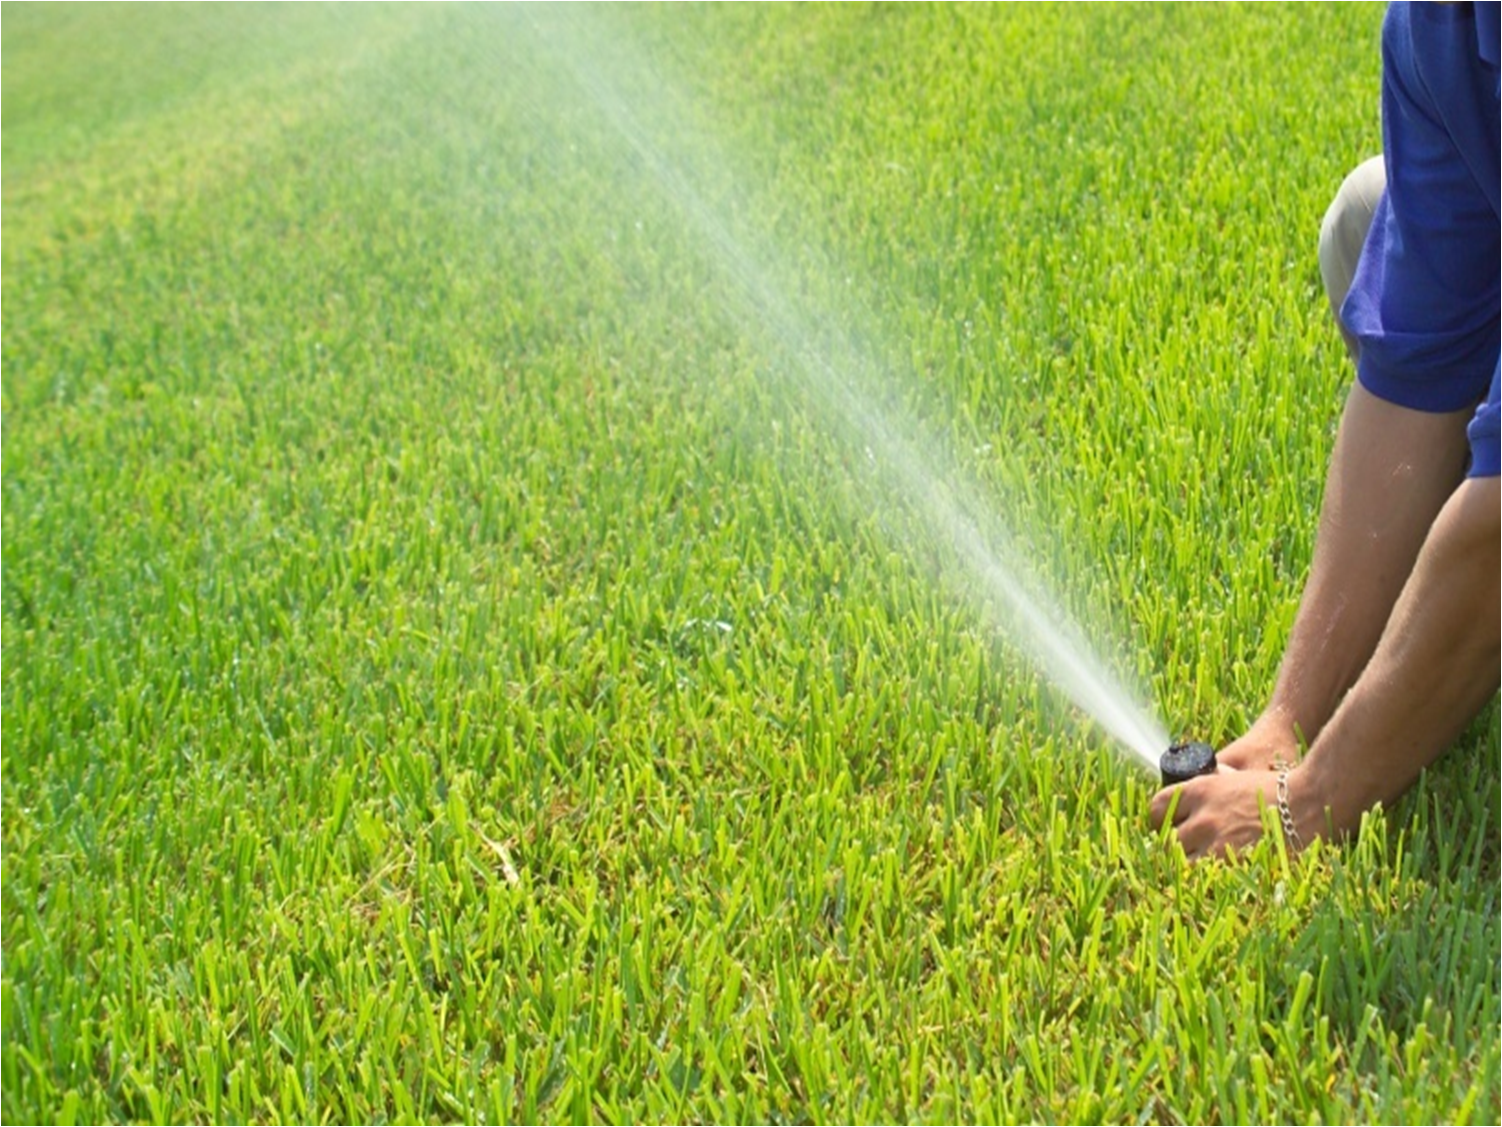 Irrigation help